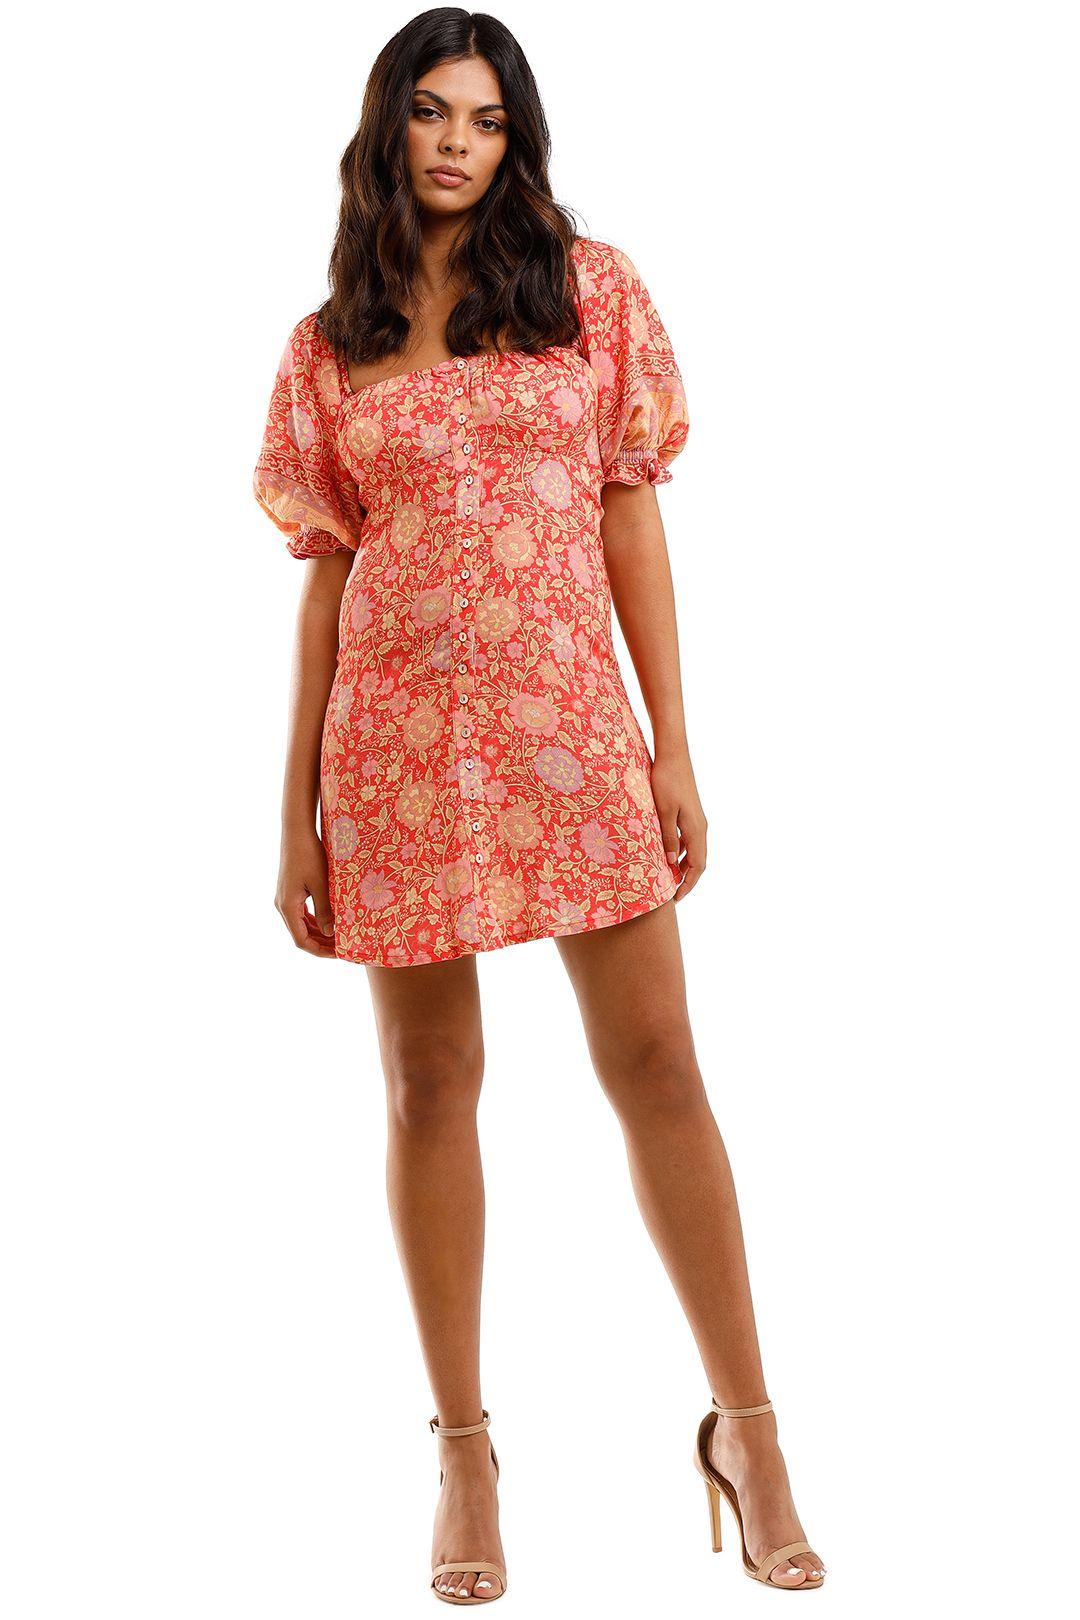 Spell Love Story Mini Dress